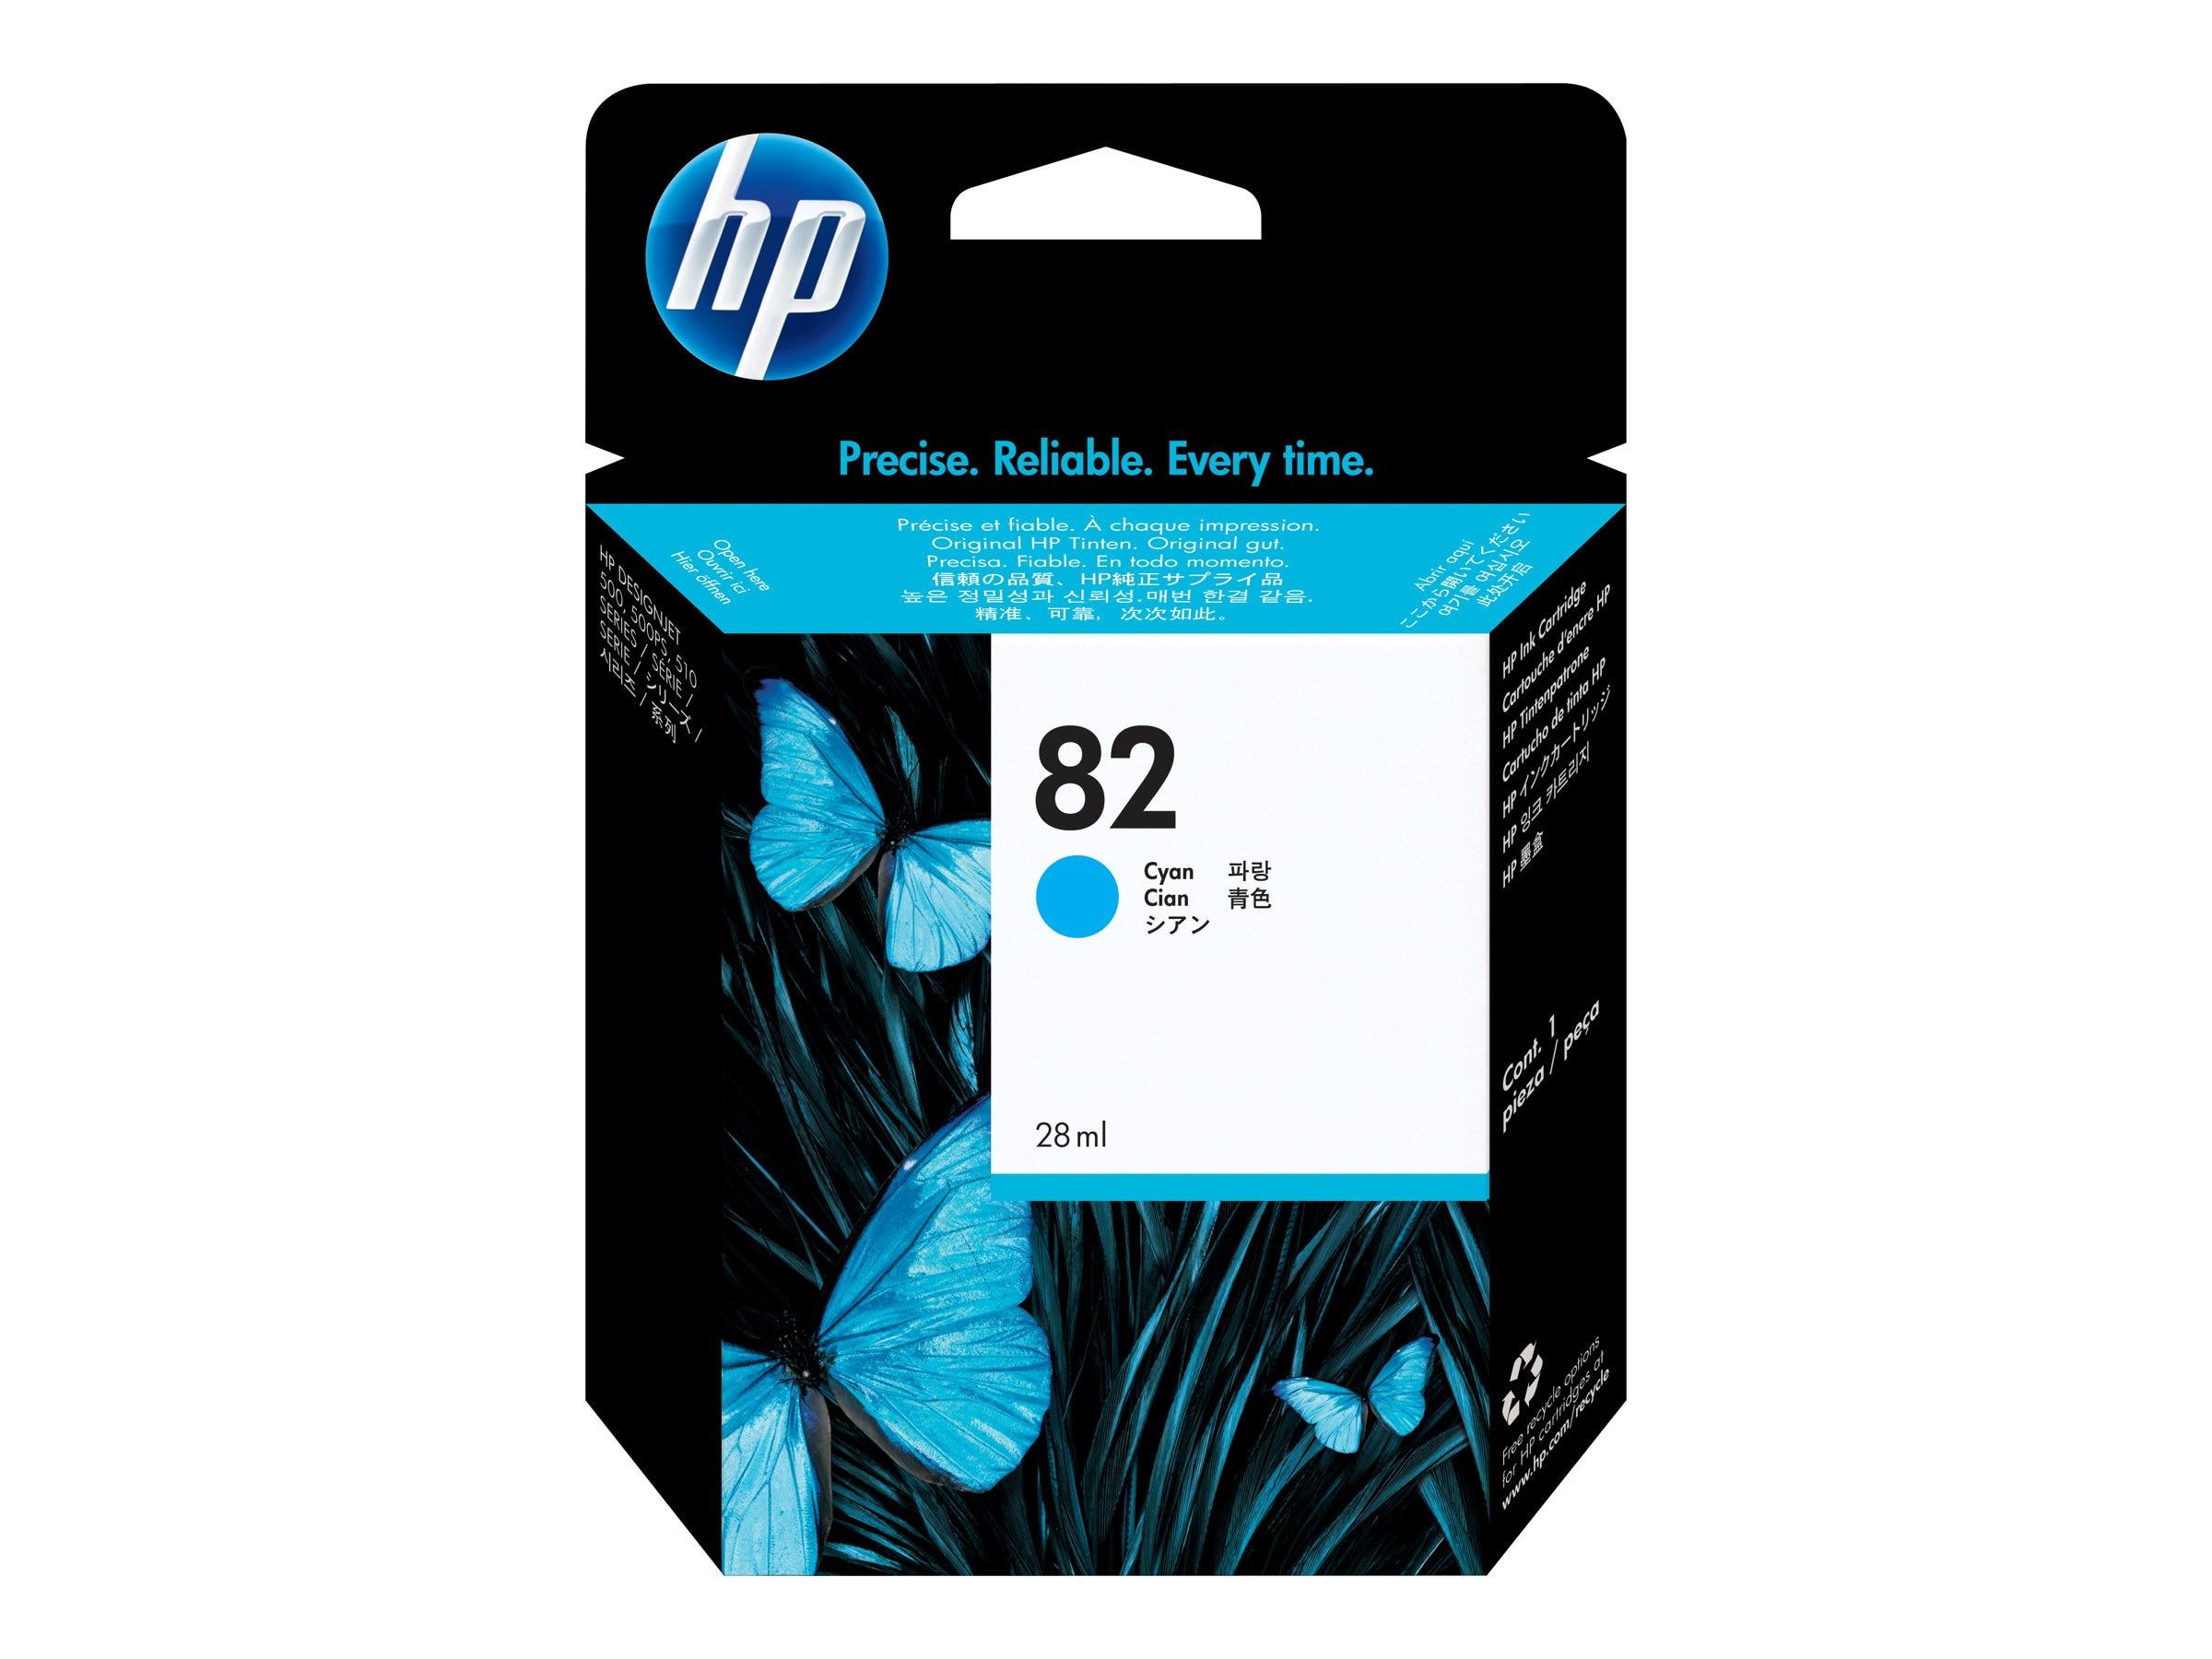 HP 82 Cyan Ink Cartridge for Designjet Printers